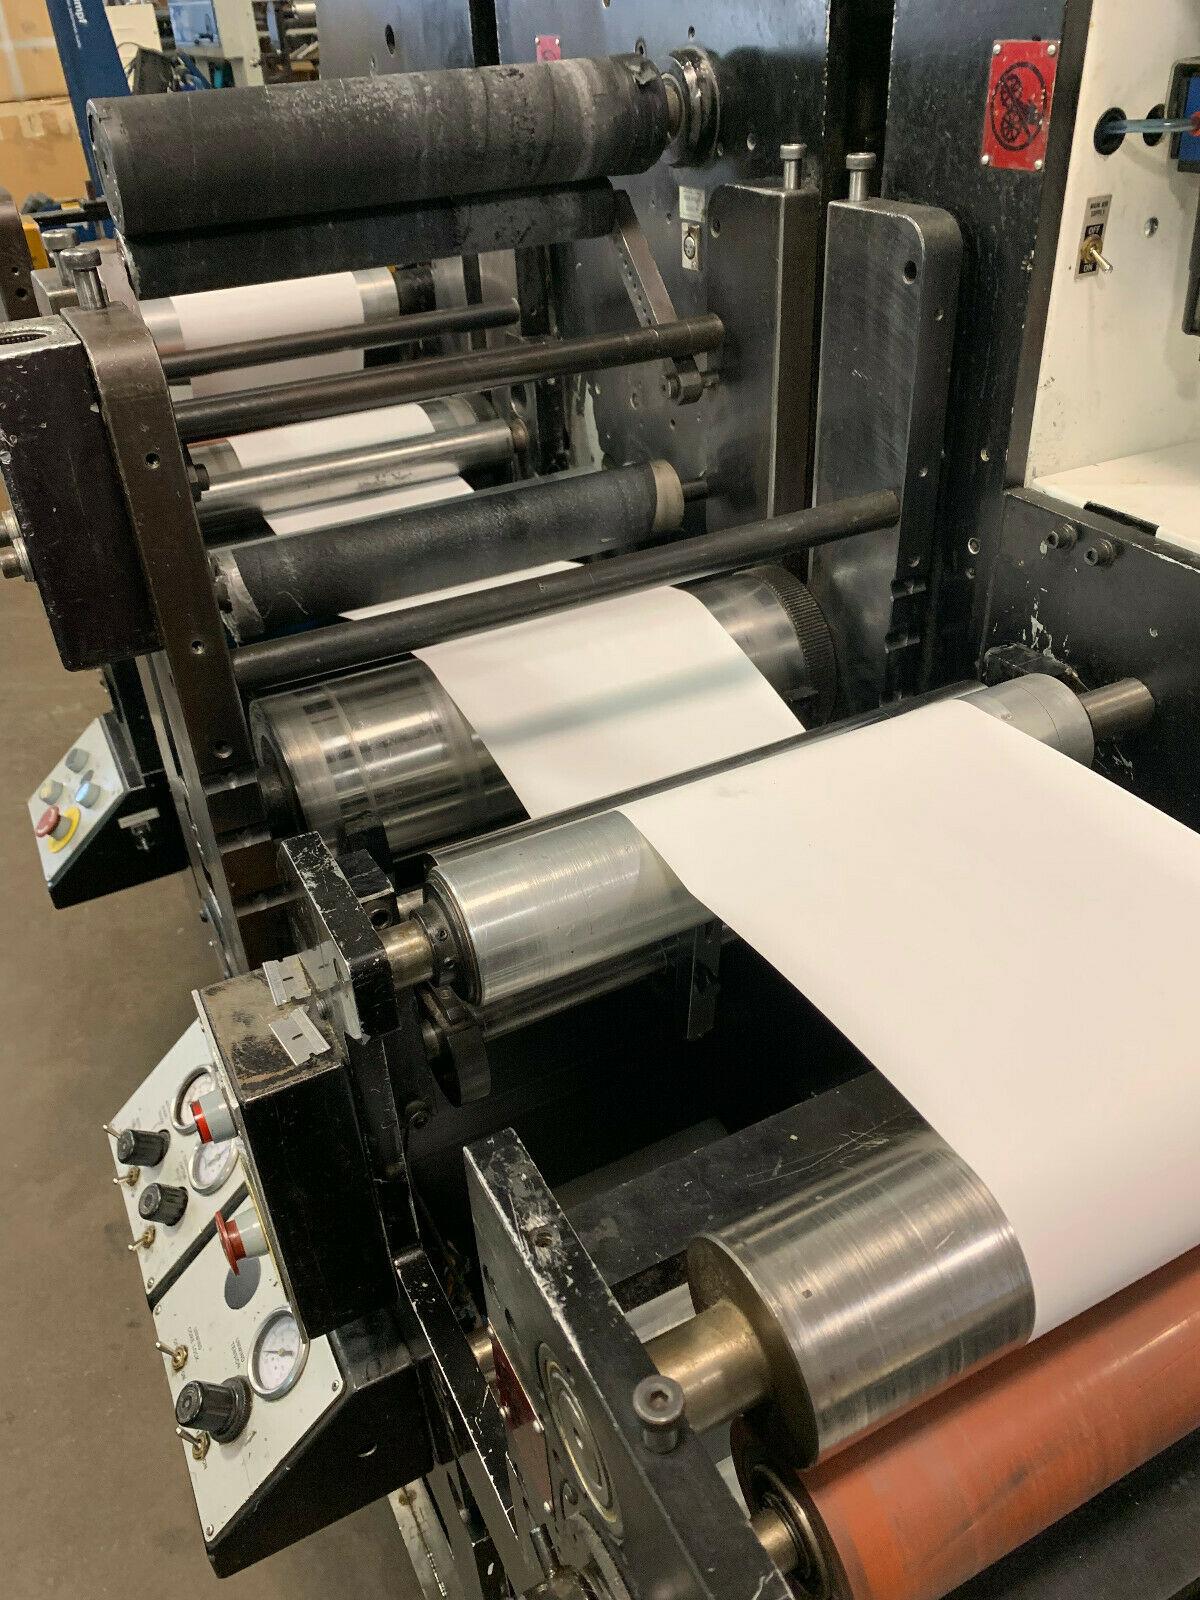 Rotoflex DLI330 - Used Flexo Printing Presses and Used Flexographic Equipment-8